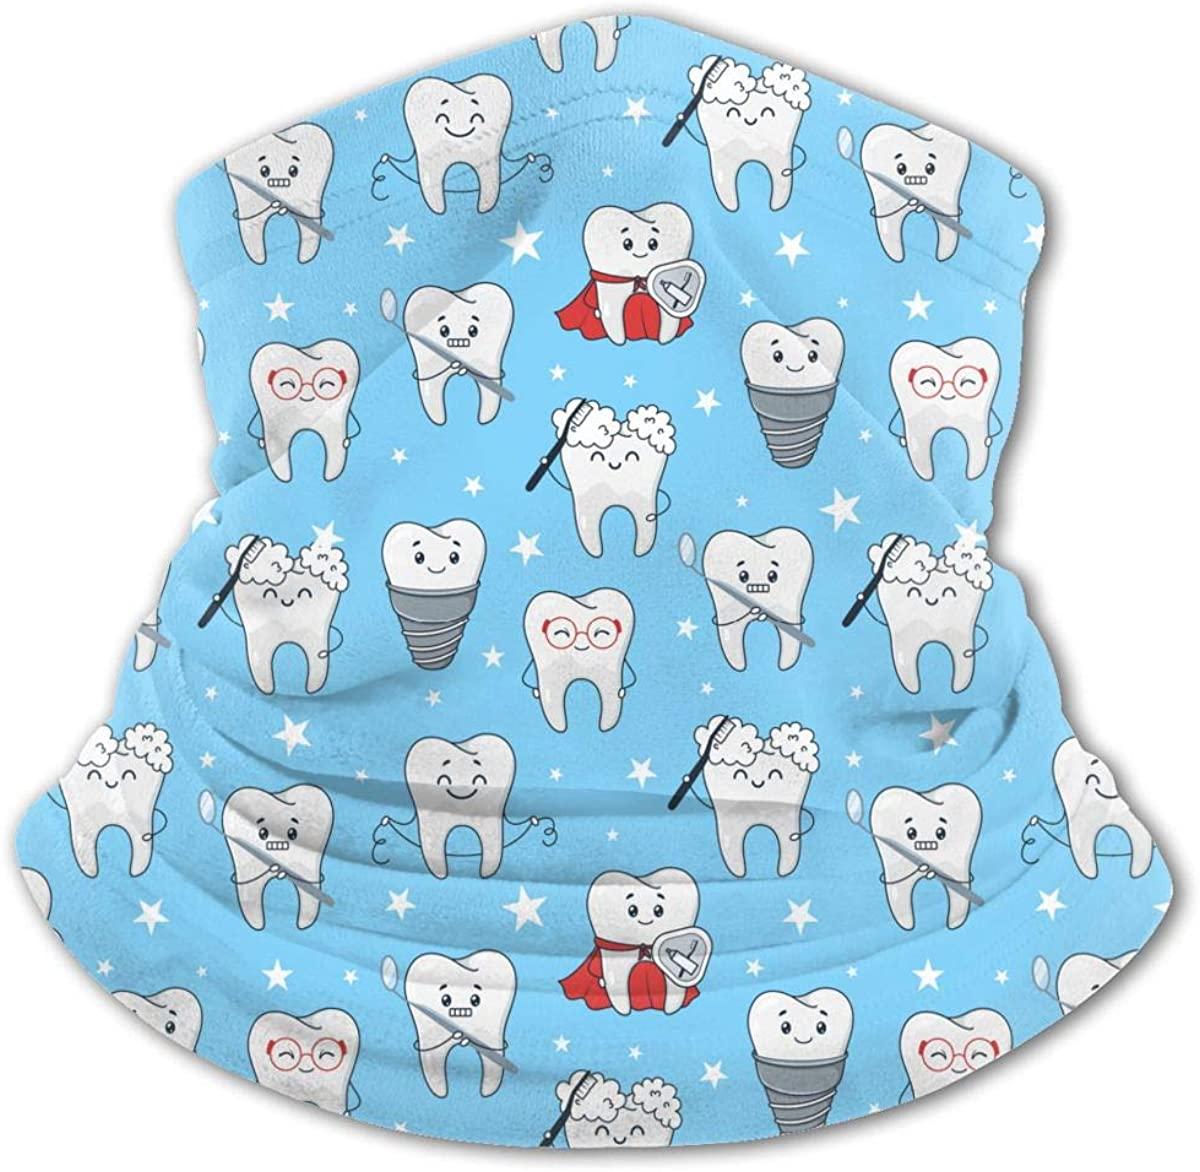 Funny Teeth Cartoon Pattern Isolated Kids Bandanas Reusable Washable Neck Gaiter Balaclava,Half Face Protective Masks